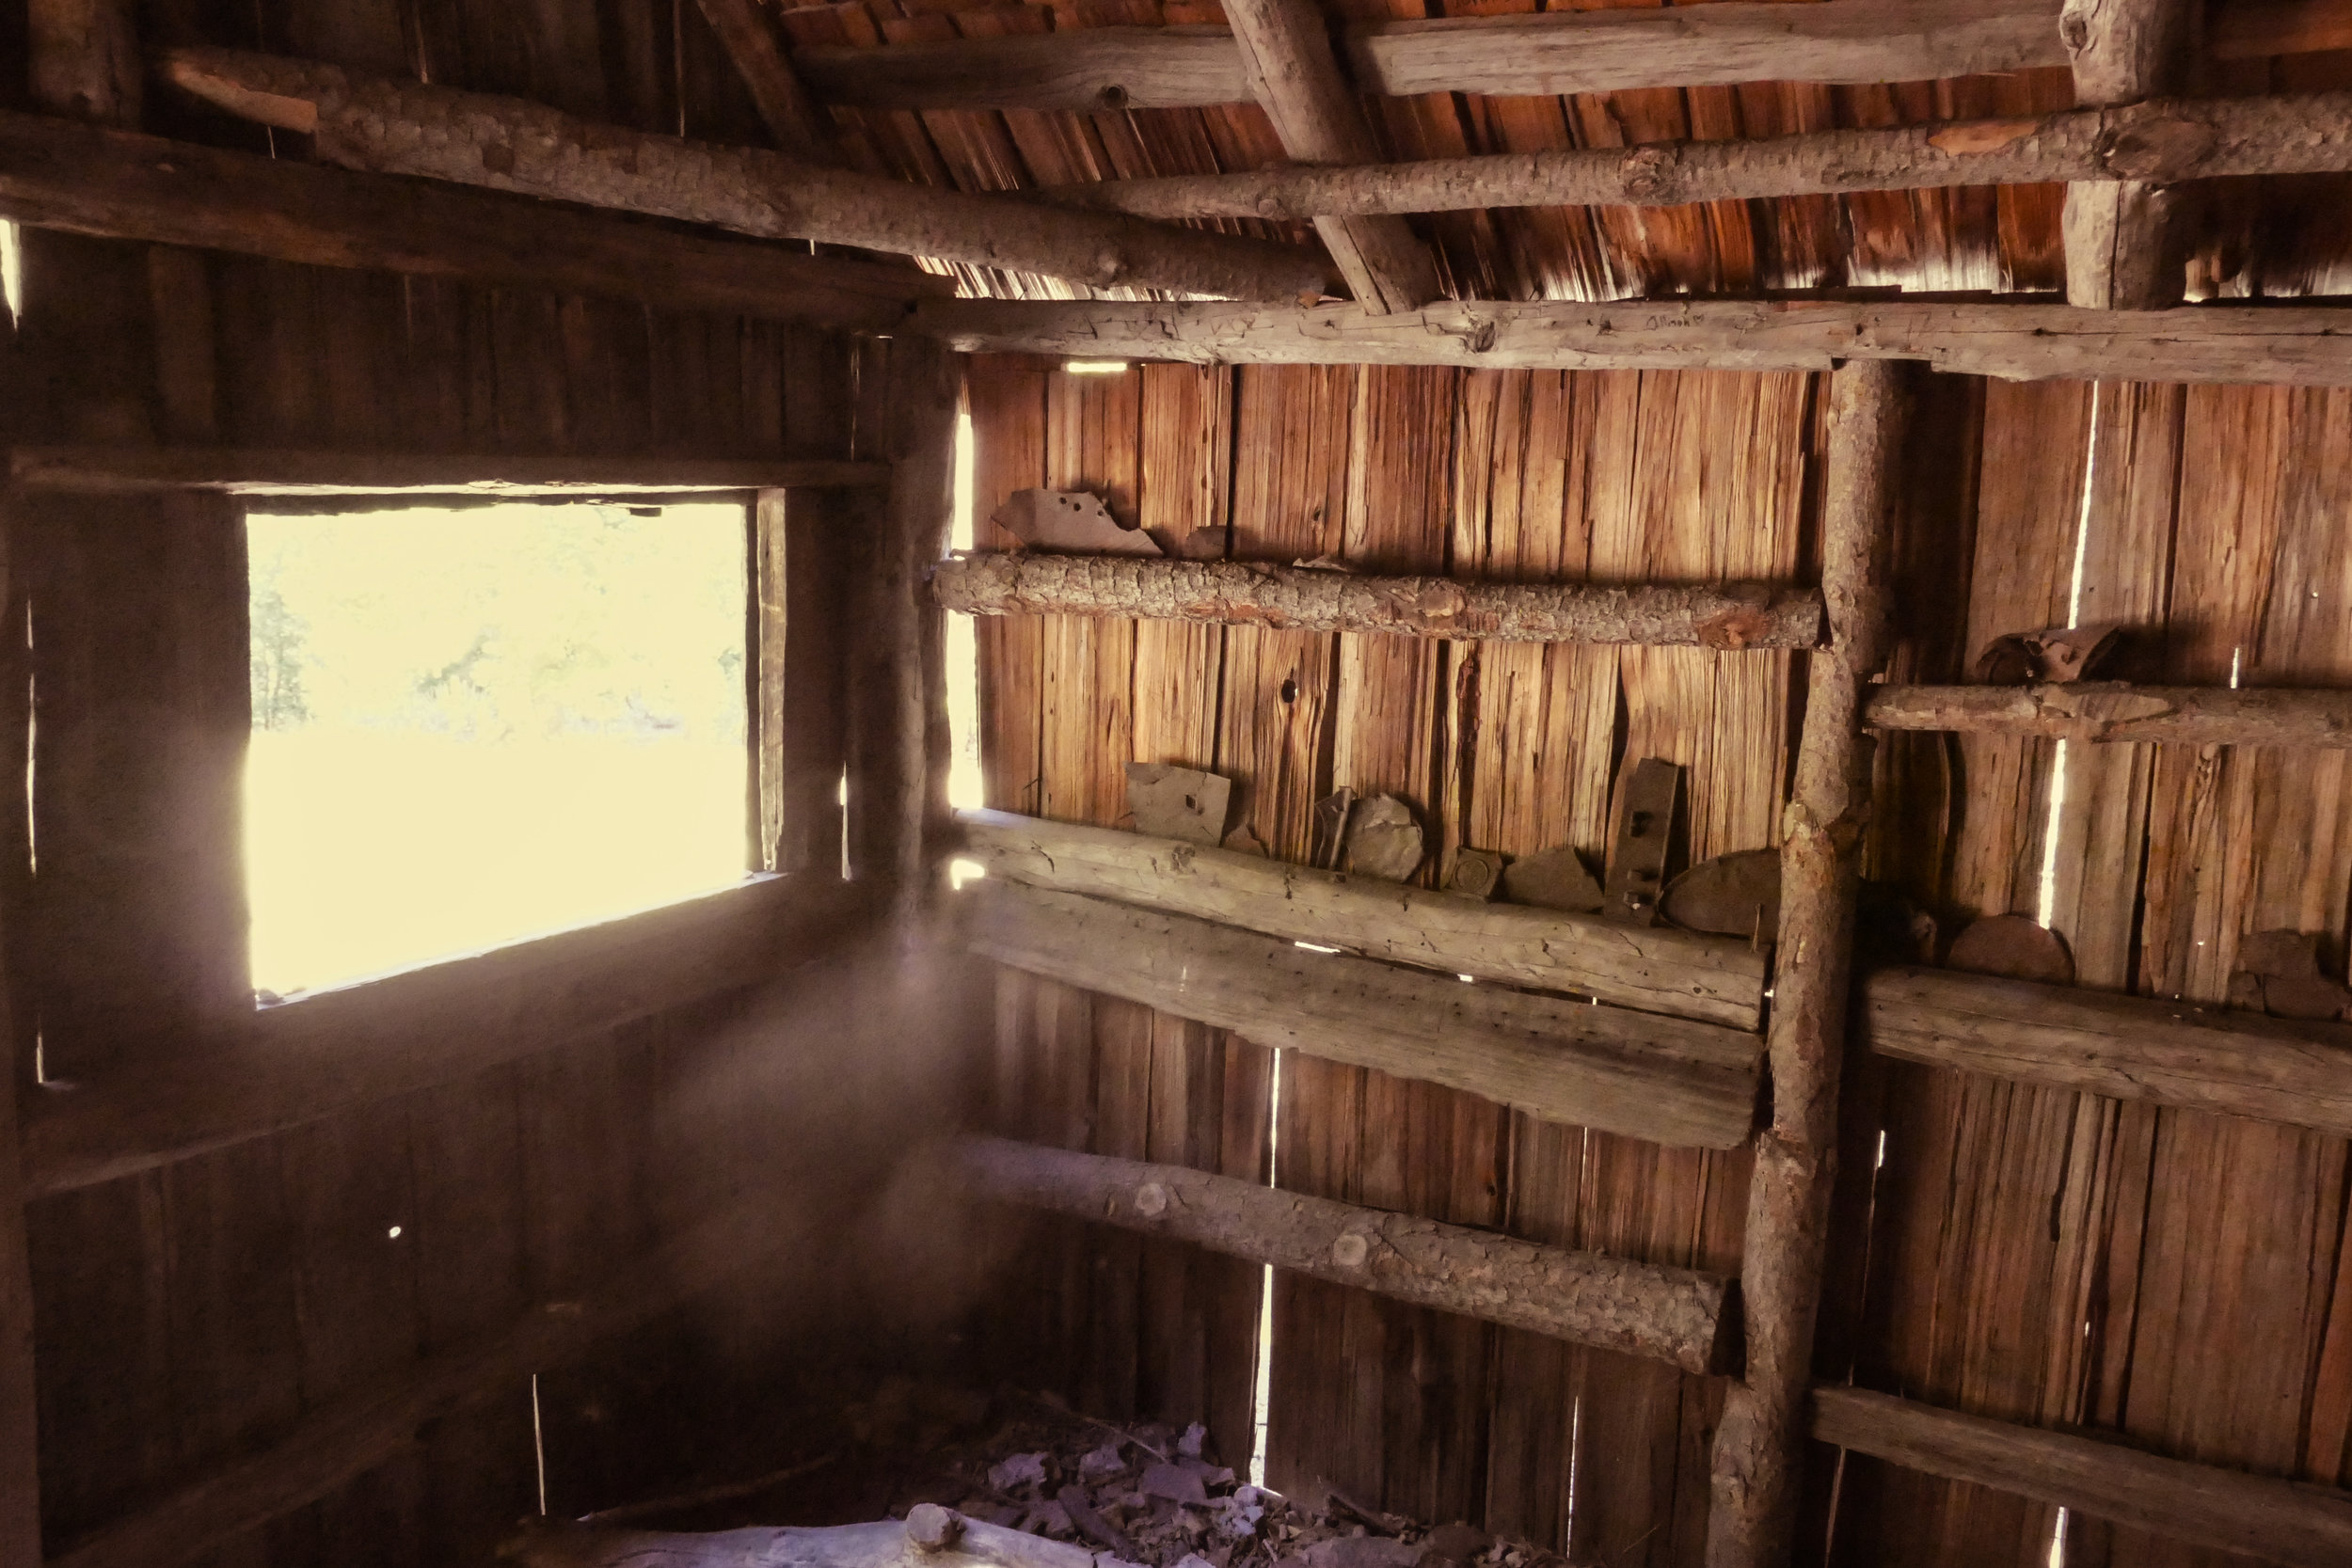 mt-baden-powell--vincents-cabin_37690768142_o.jpg